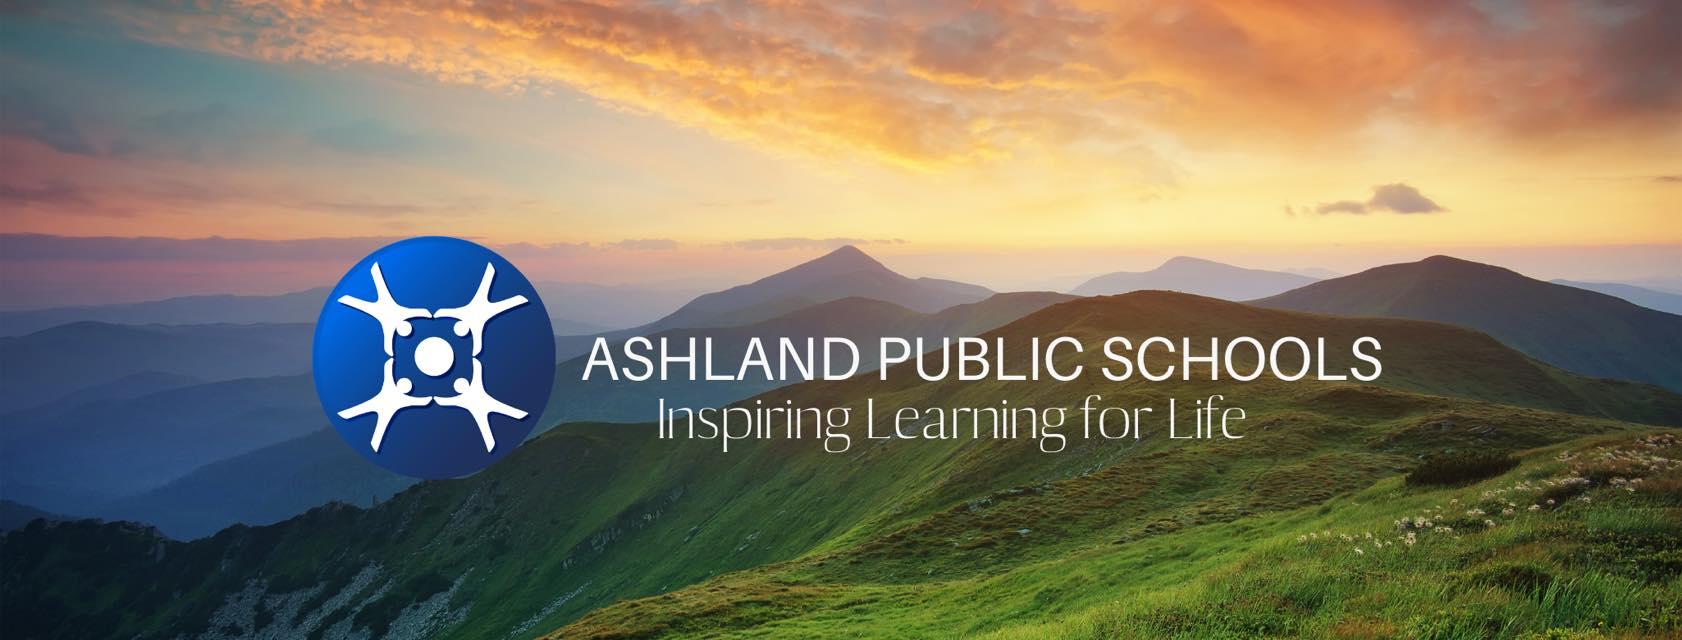 Ashland Inspiring Learning for Life